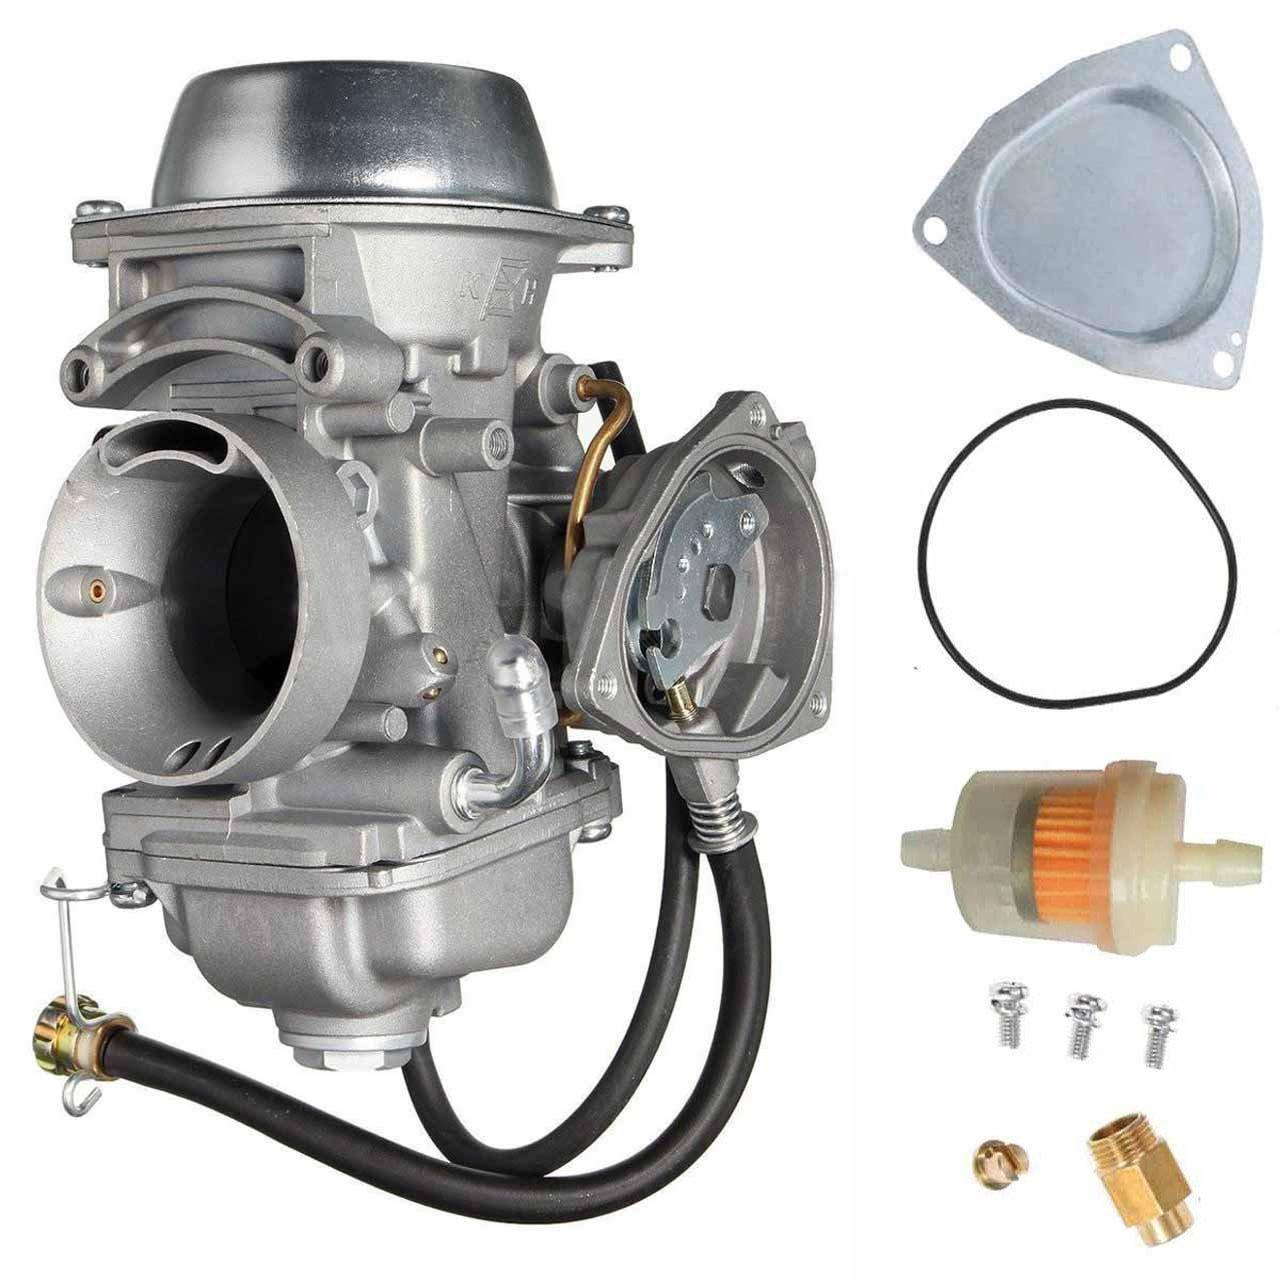 Carburetor For Polaris Sportsman 500 4X4 HO 2001-2005 2010 2011 2012 Carb New by Fuerdi